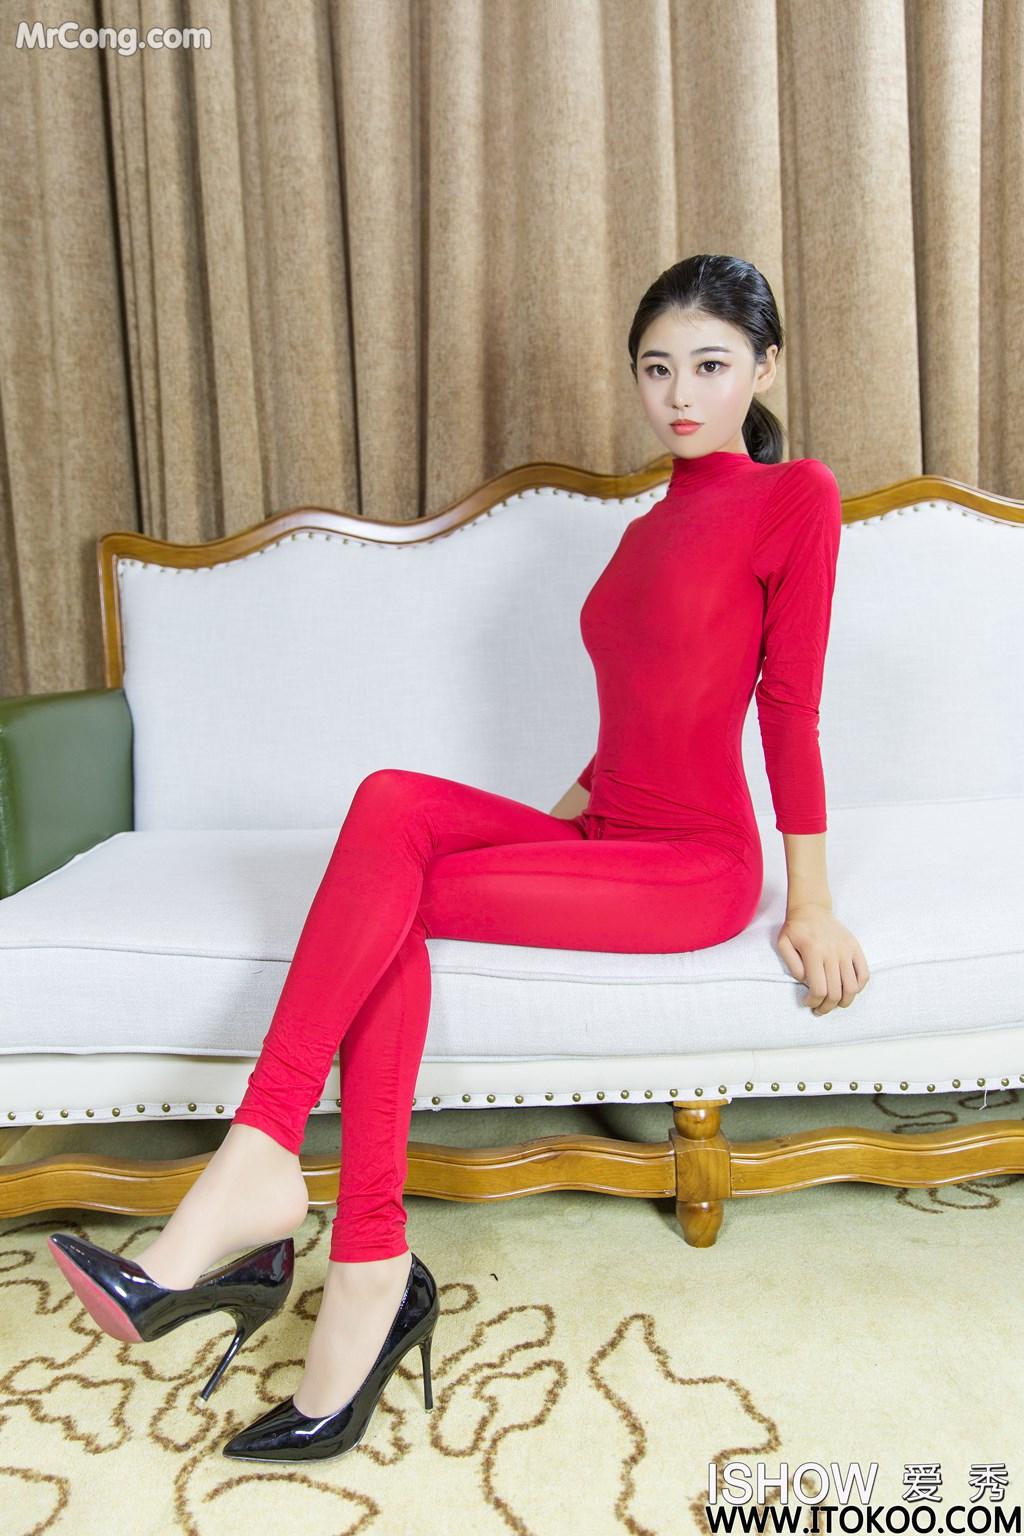 Image ISHOW-No.184-Phoebe-MrCong.com-005 in post ISHOW No.184: Người mẫu 刘玥菲Phoebe (31 ảnh)